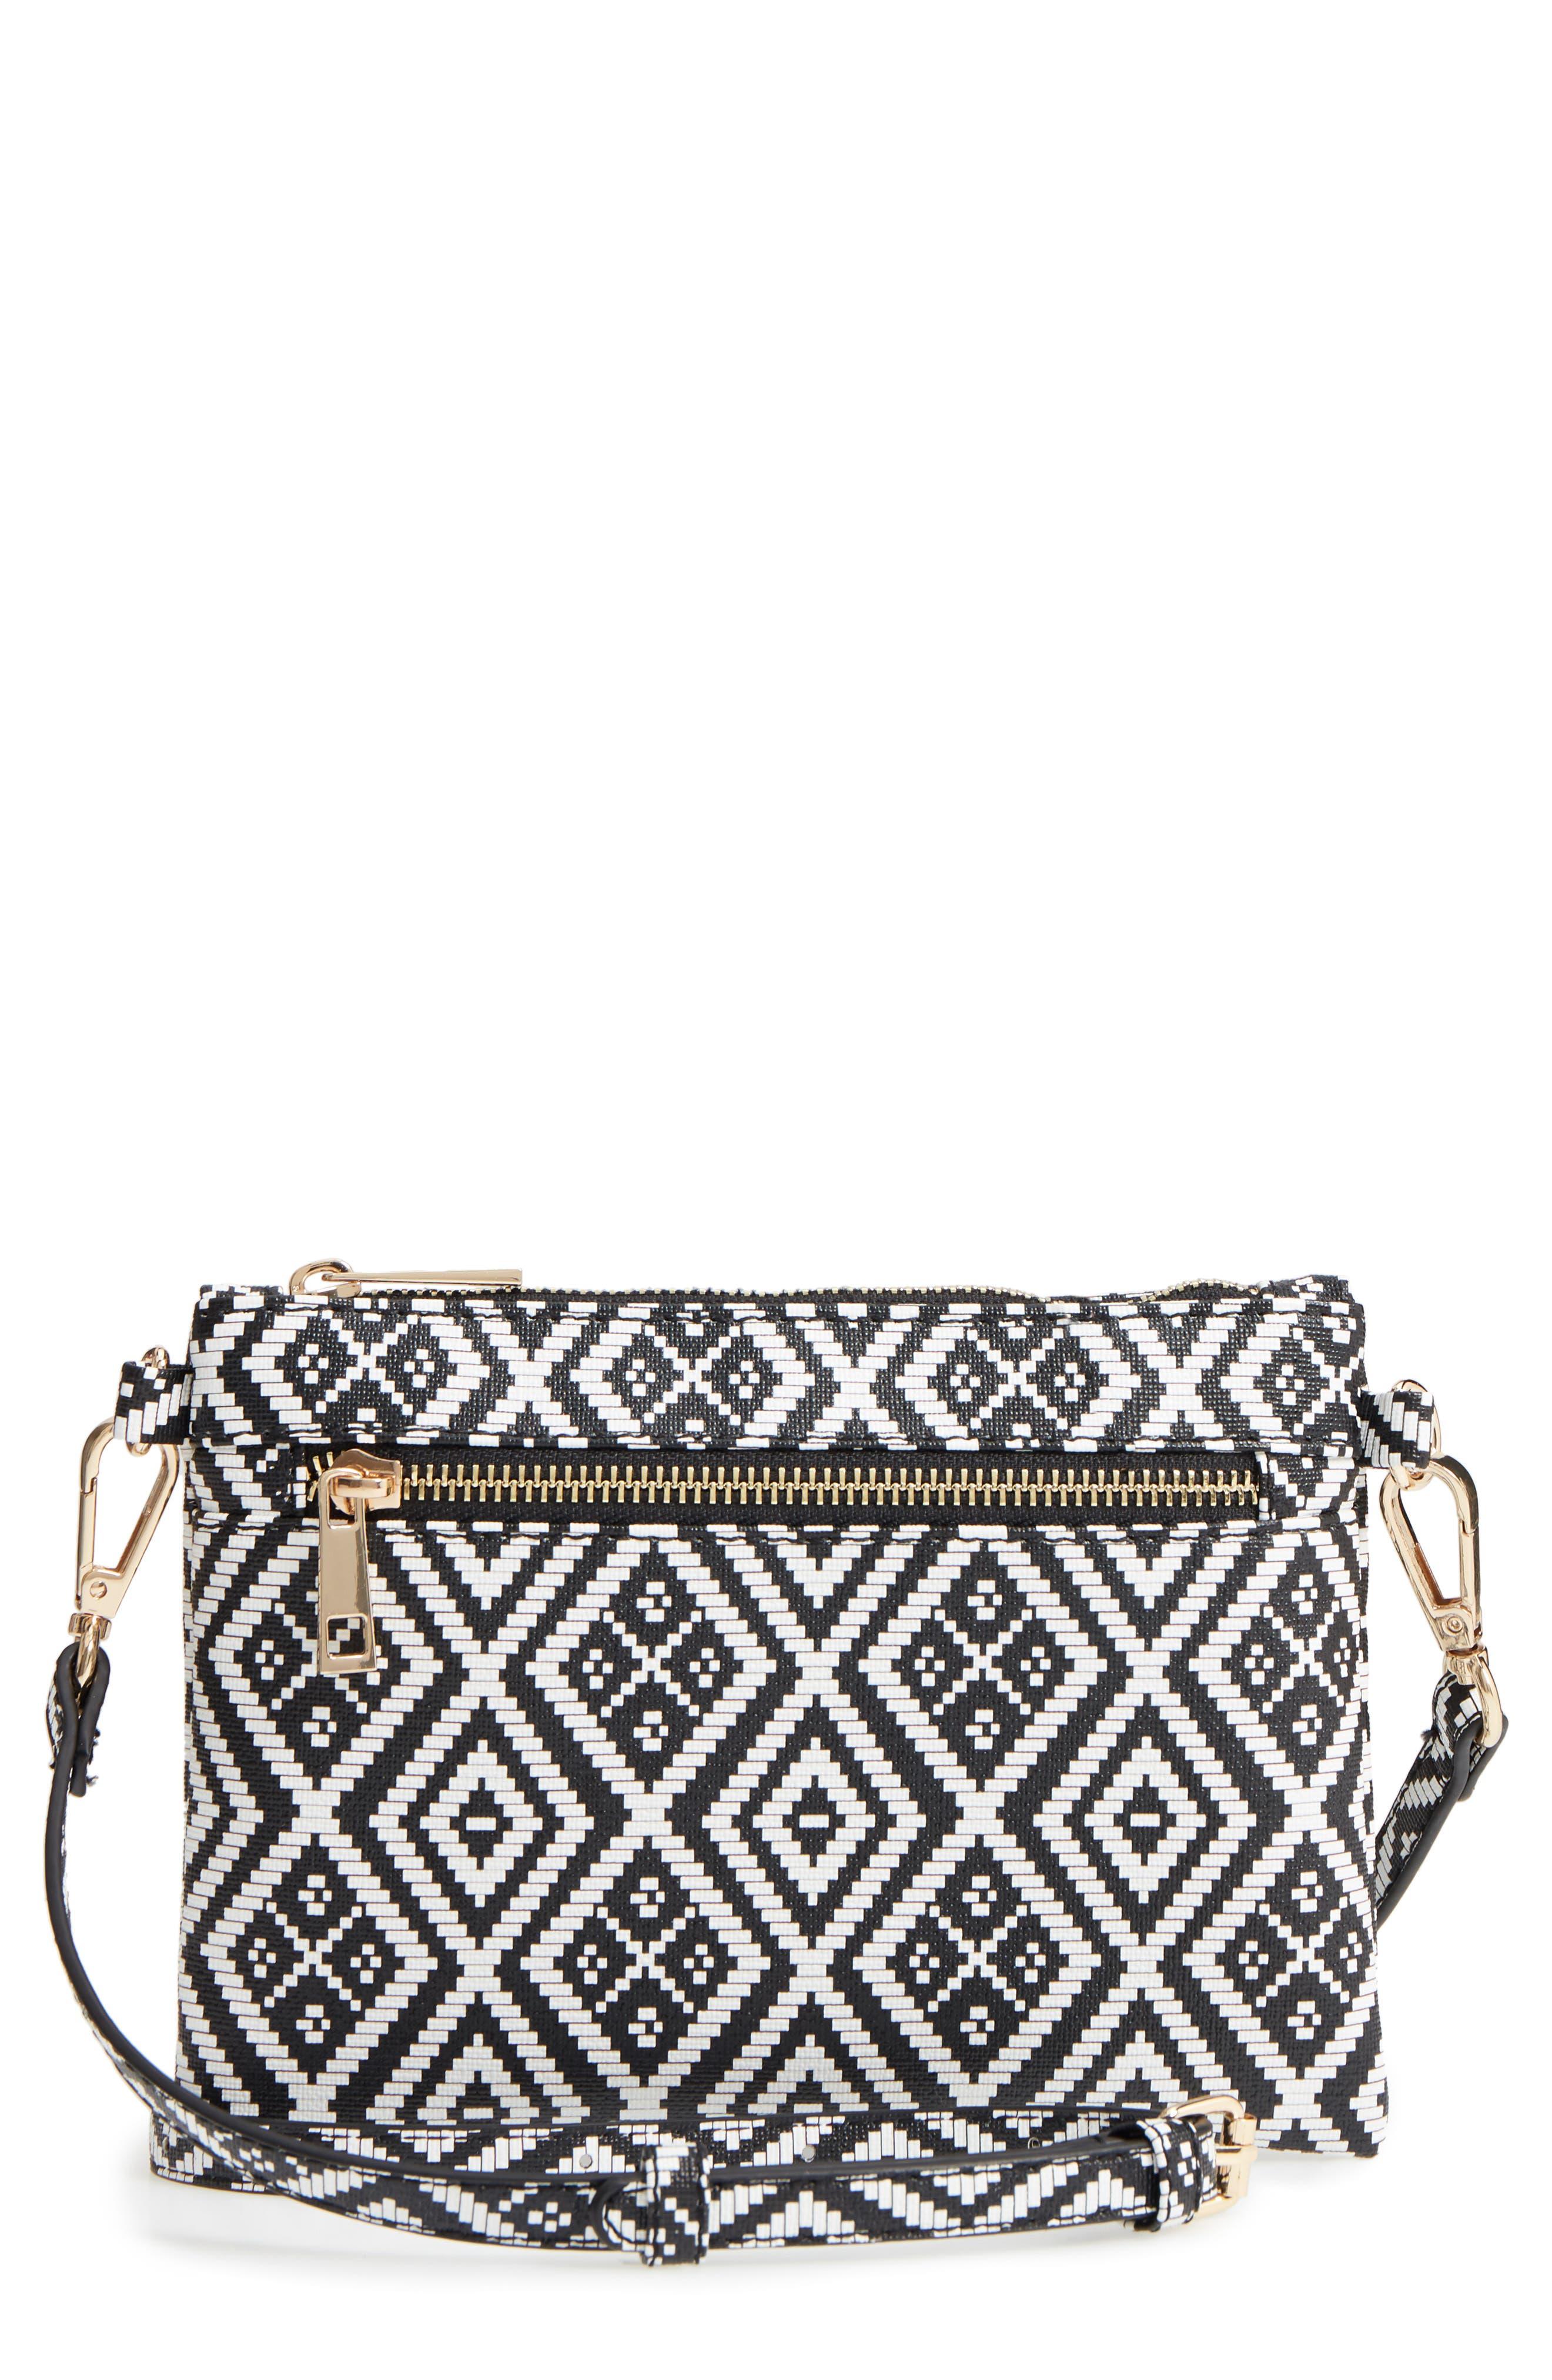 Weave Pattern Convertible Crossbody Wristlet,                         Main,                         color, Black/ White